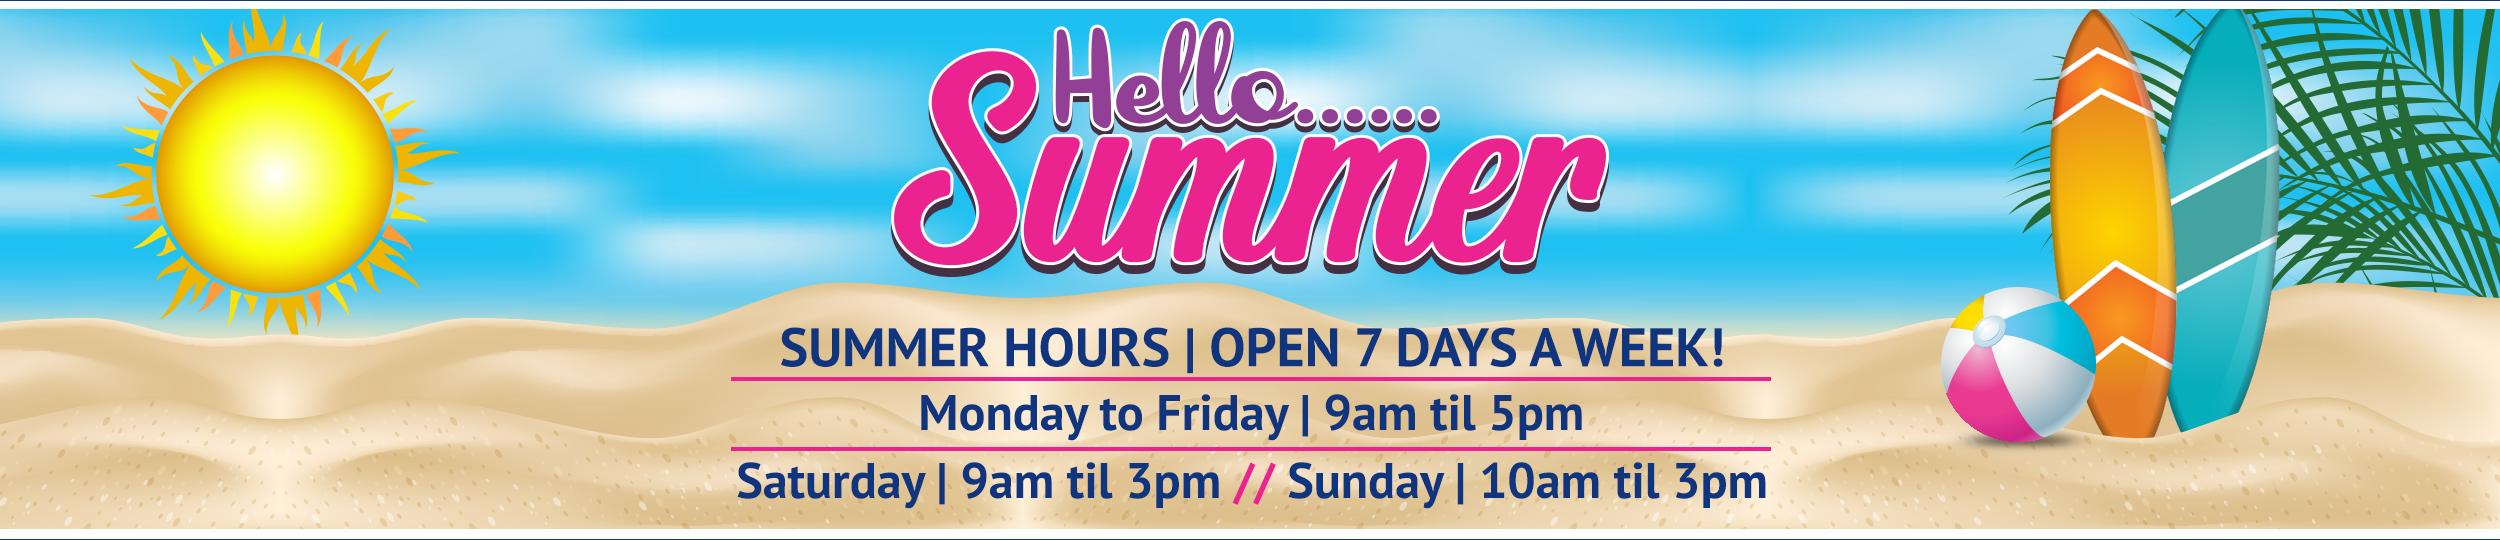 Hello Summer Banner - Summer Opening Hours